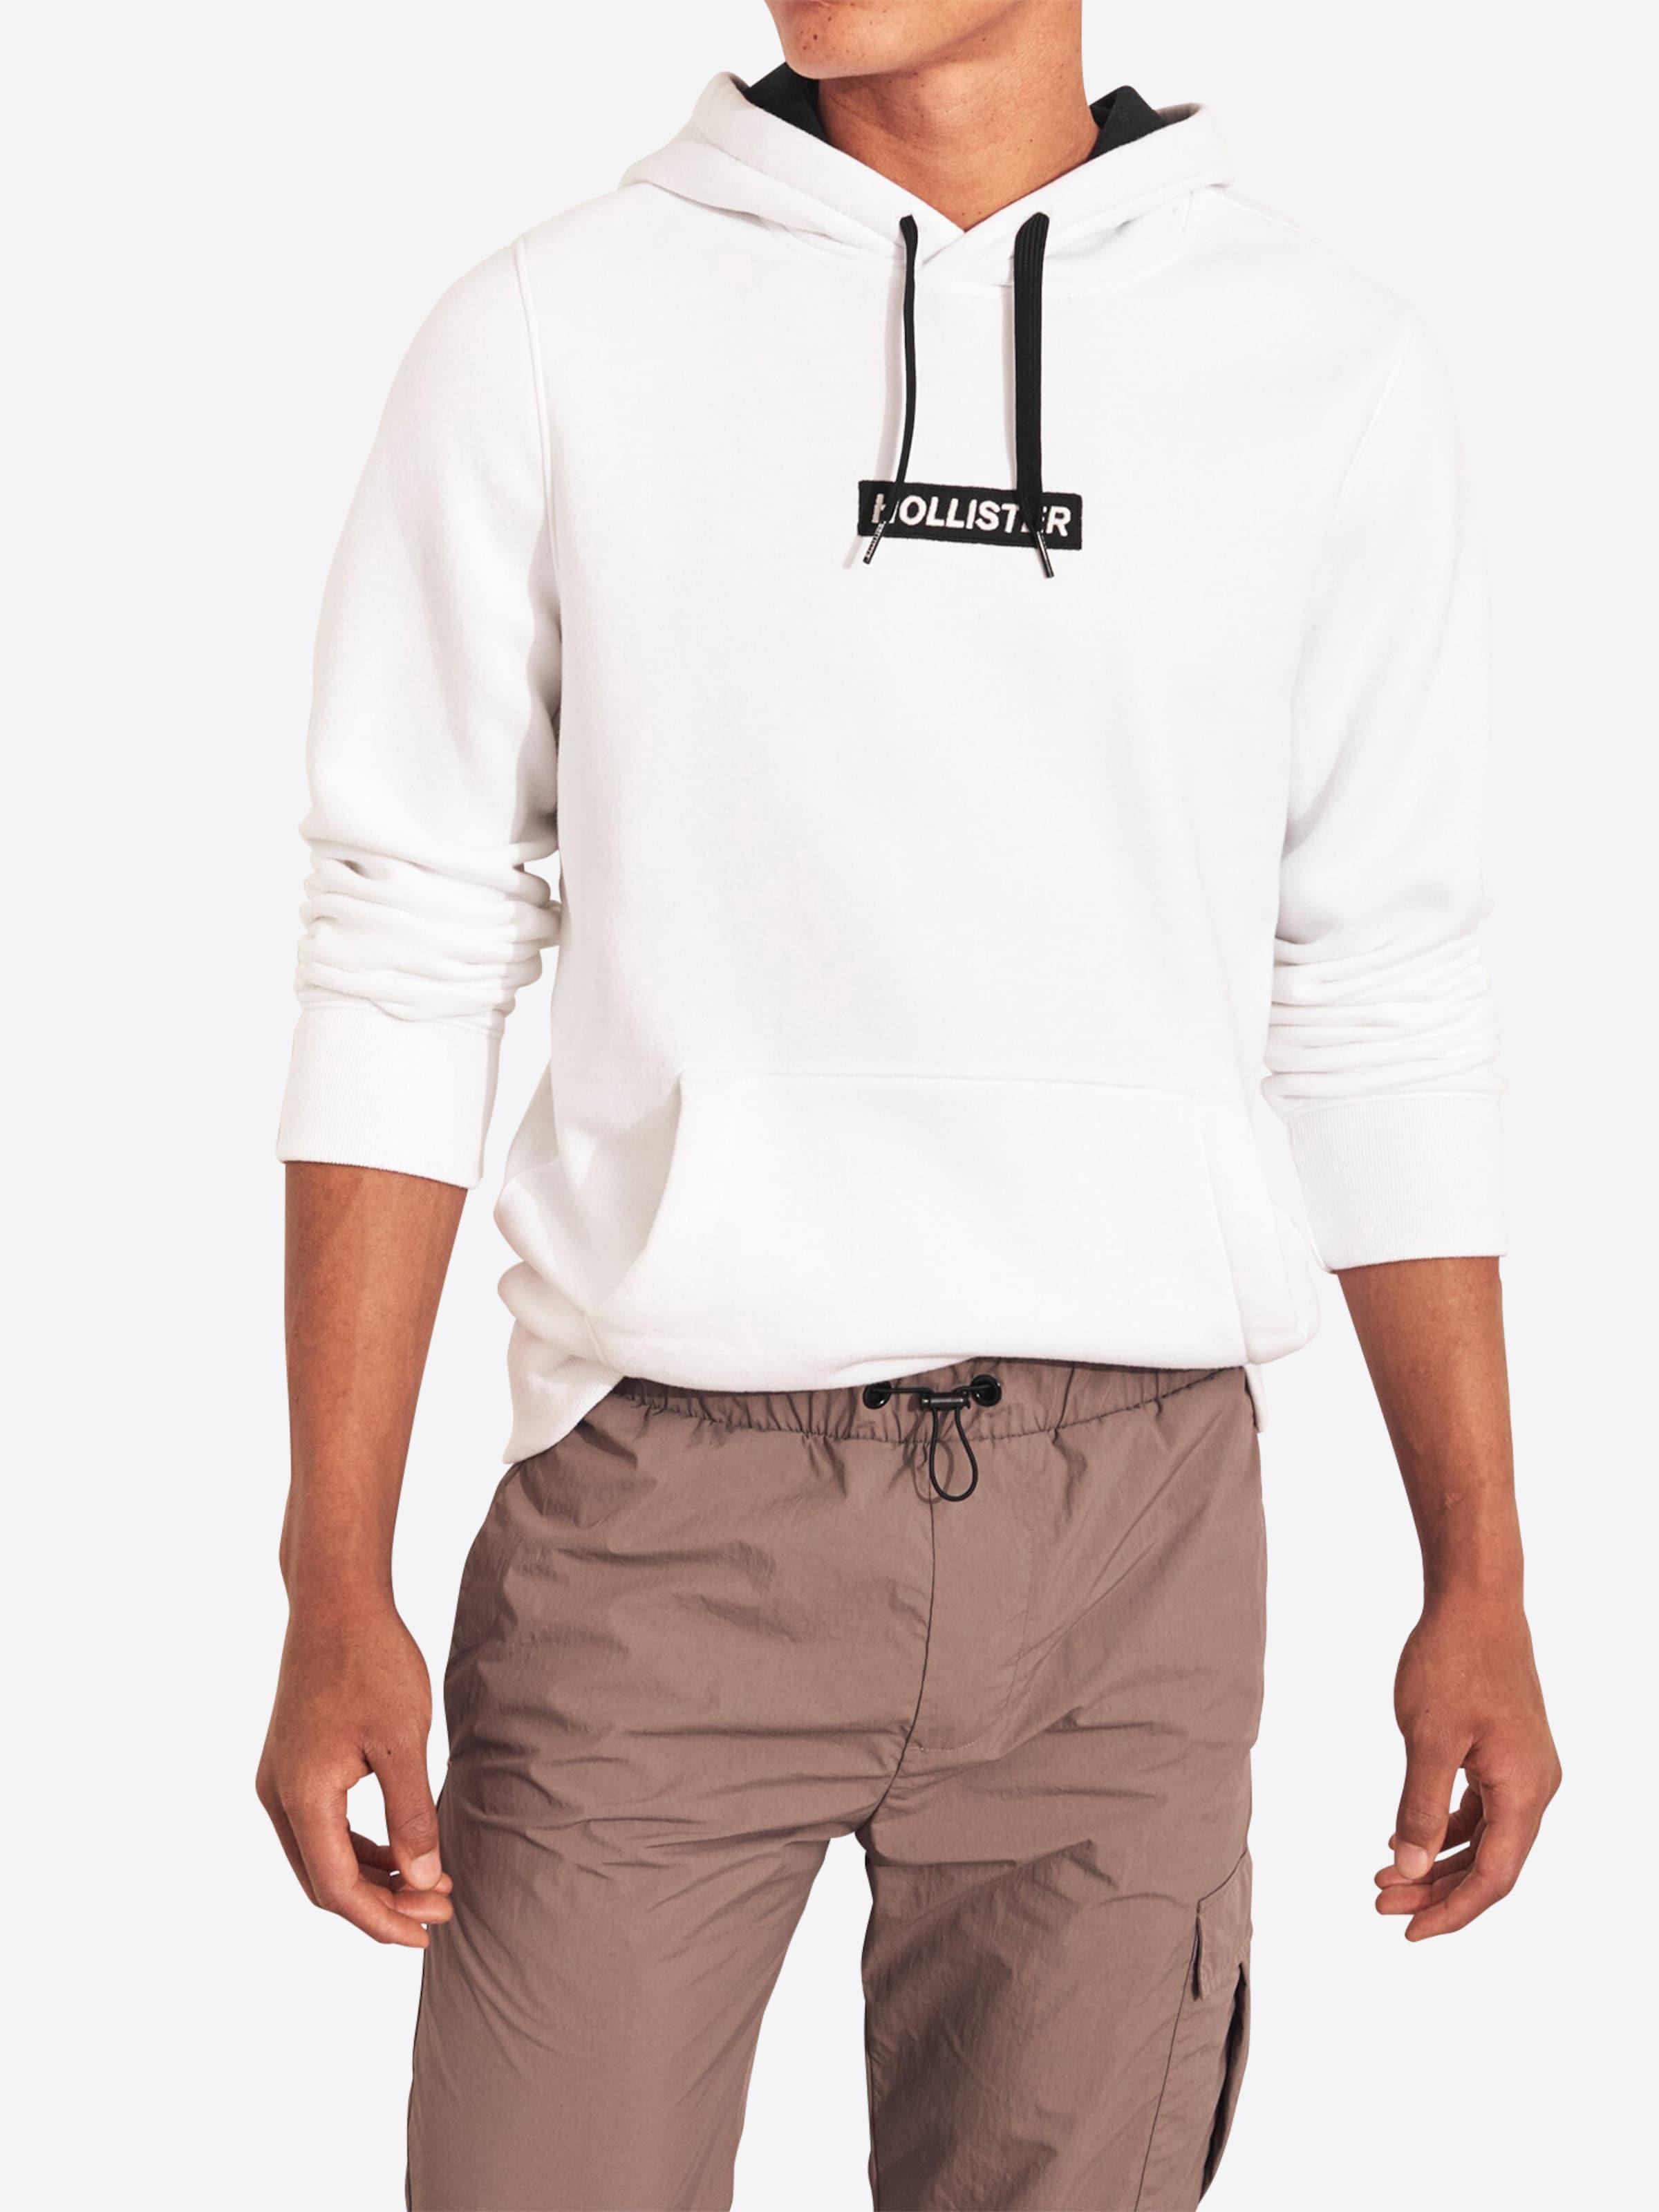 En Blanc shirt Sweat Hollister En Hollister En Sweat Hollister shirt Sweat shirt Blanc 1uKFTlc3J